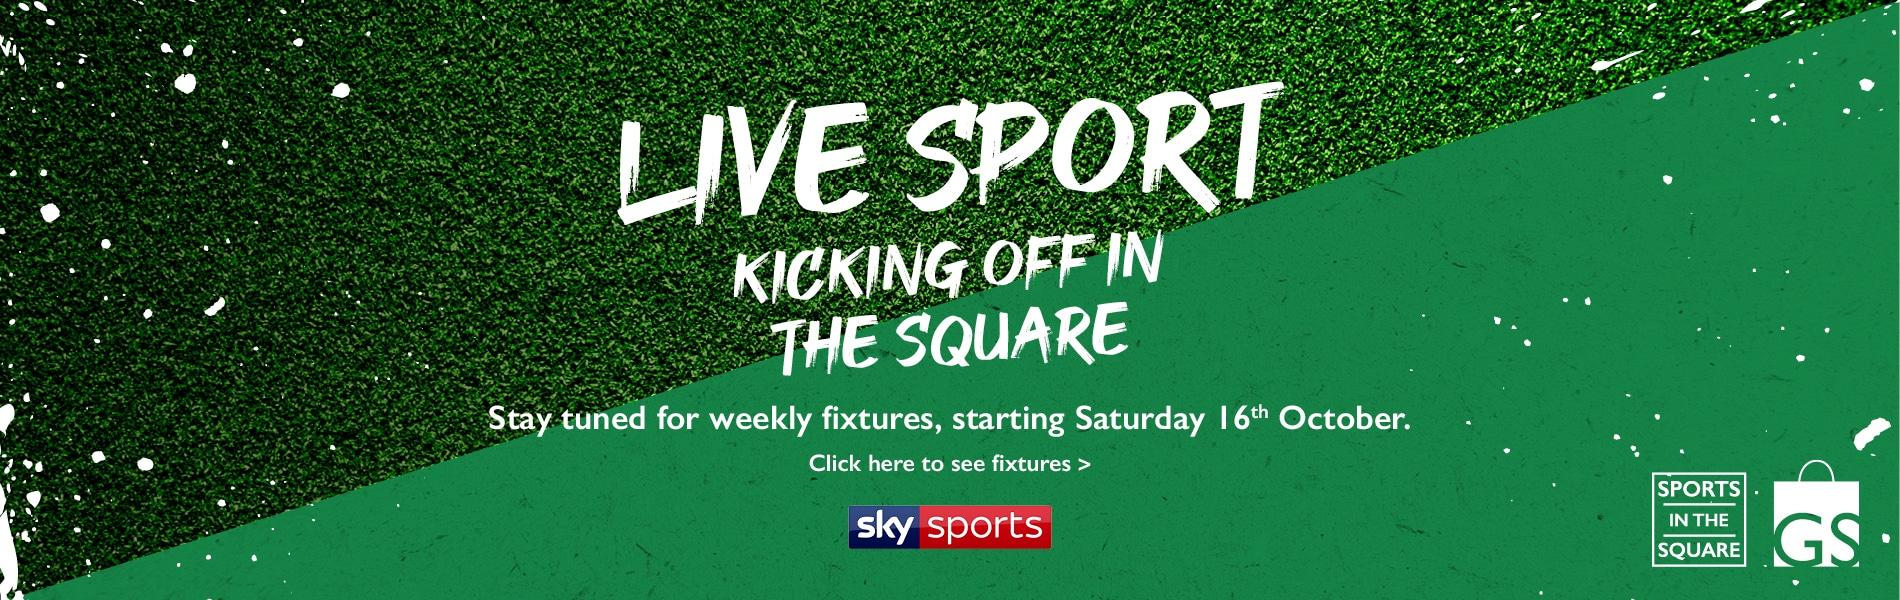 Live sports web banner